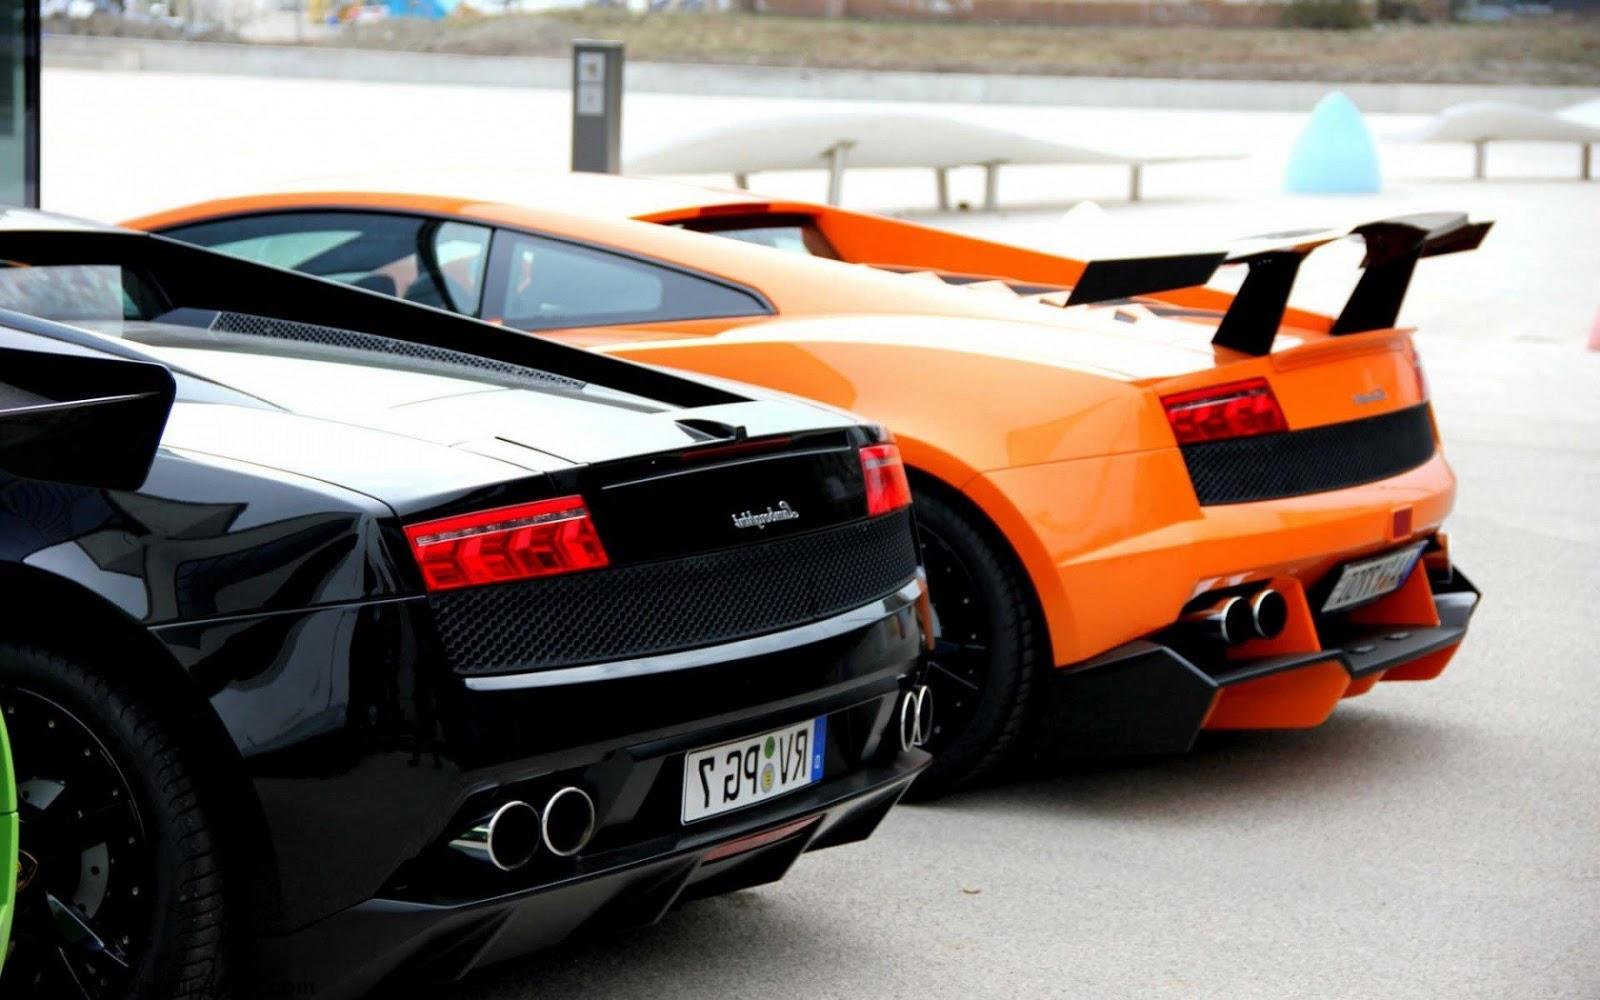 fast and furious 6 cars fast and furious 6 cars 1600x1000